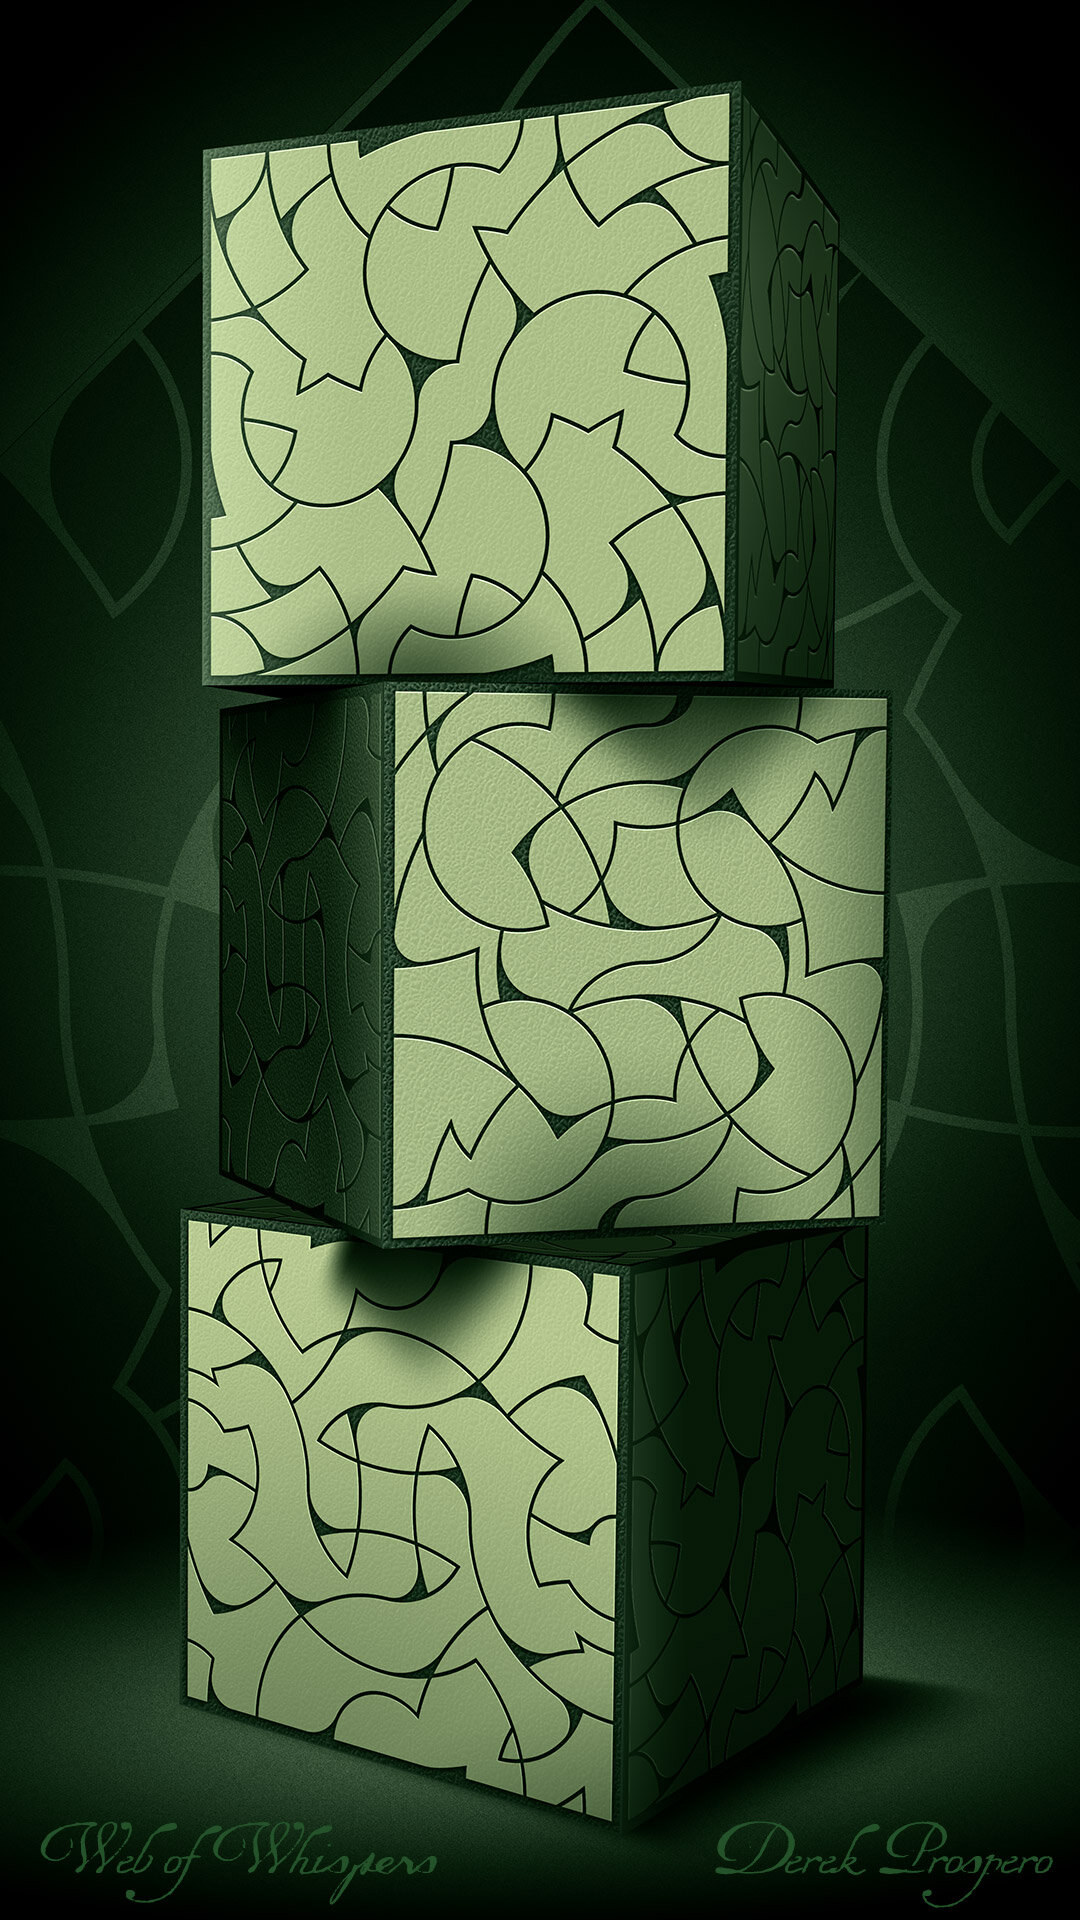 cube-web-2.jpg